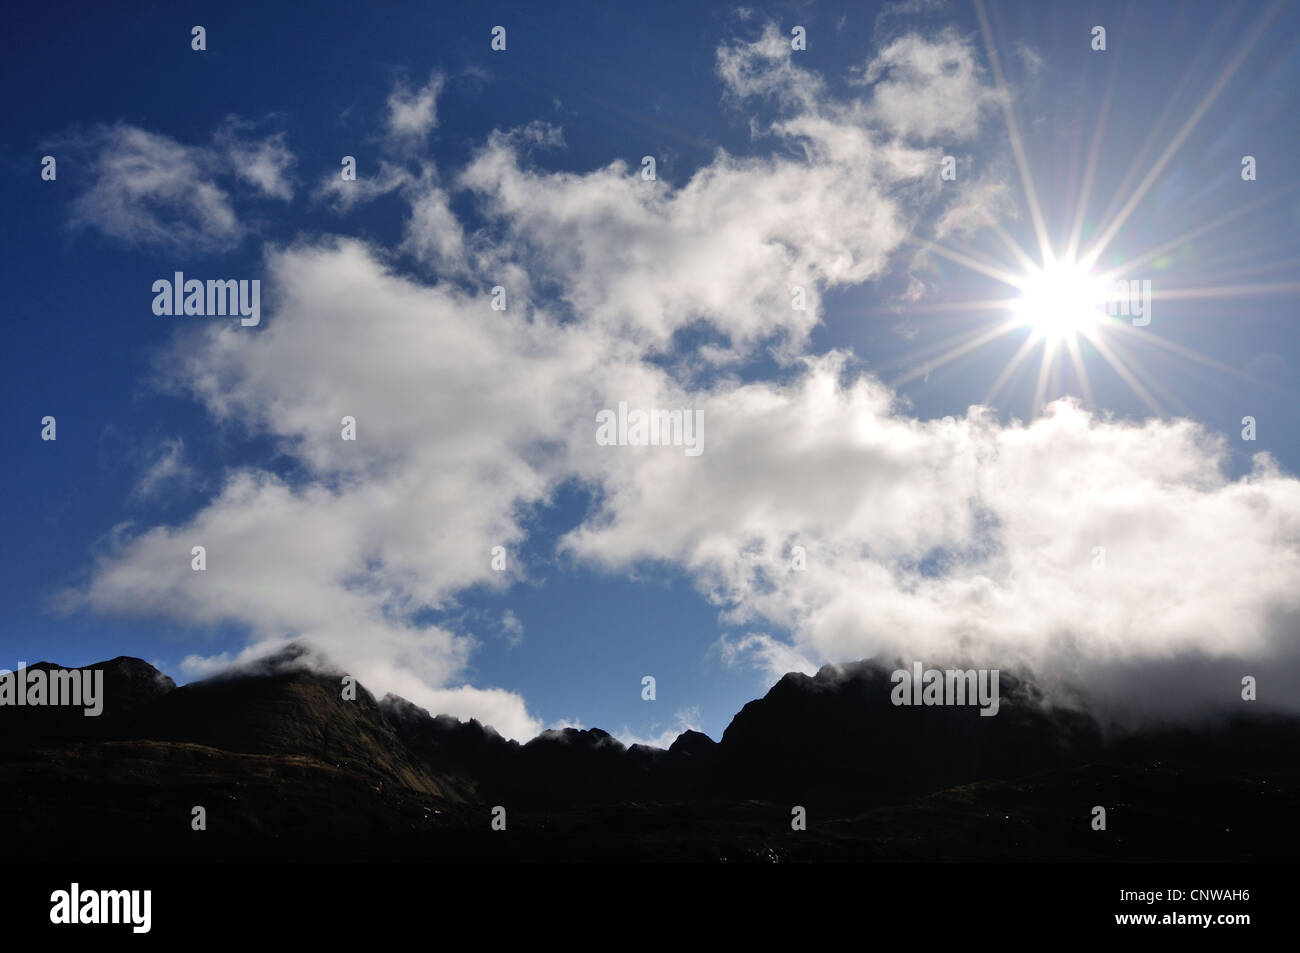 Starburst over the Pinnacle Ridge of Liathach, Torridon, Wester Ross, Scottish Highlands, Scotland - Stock Image